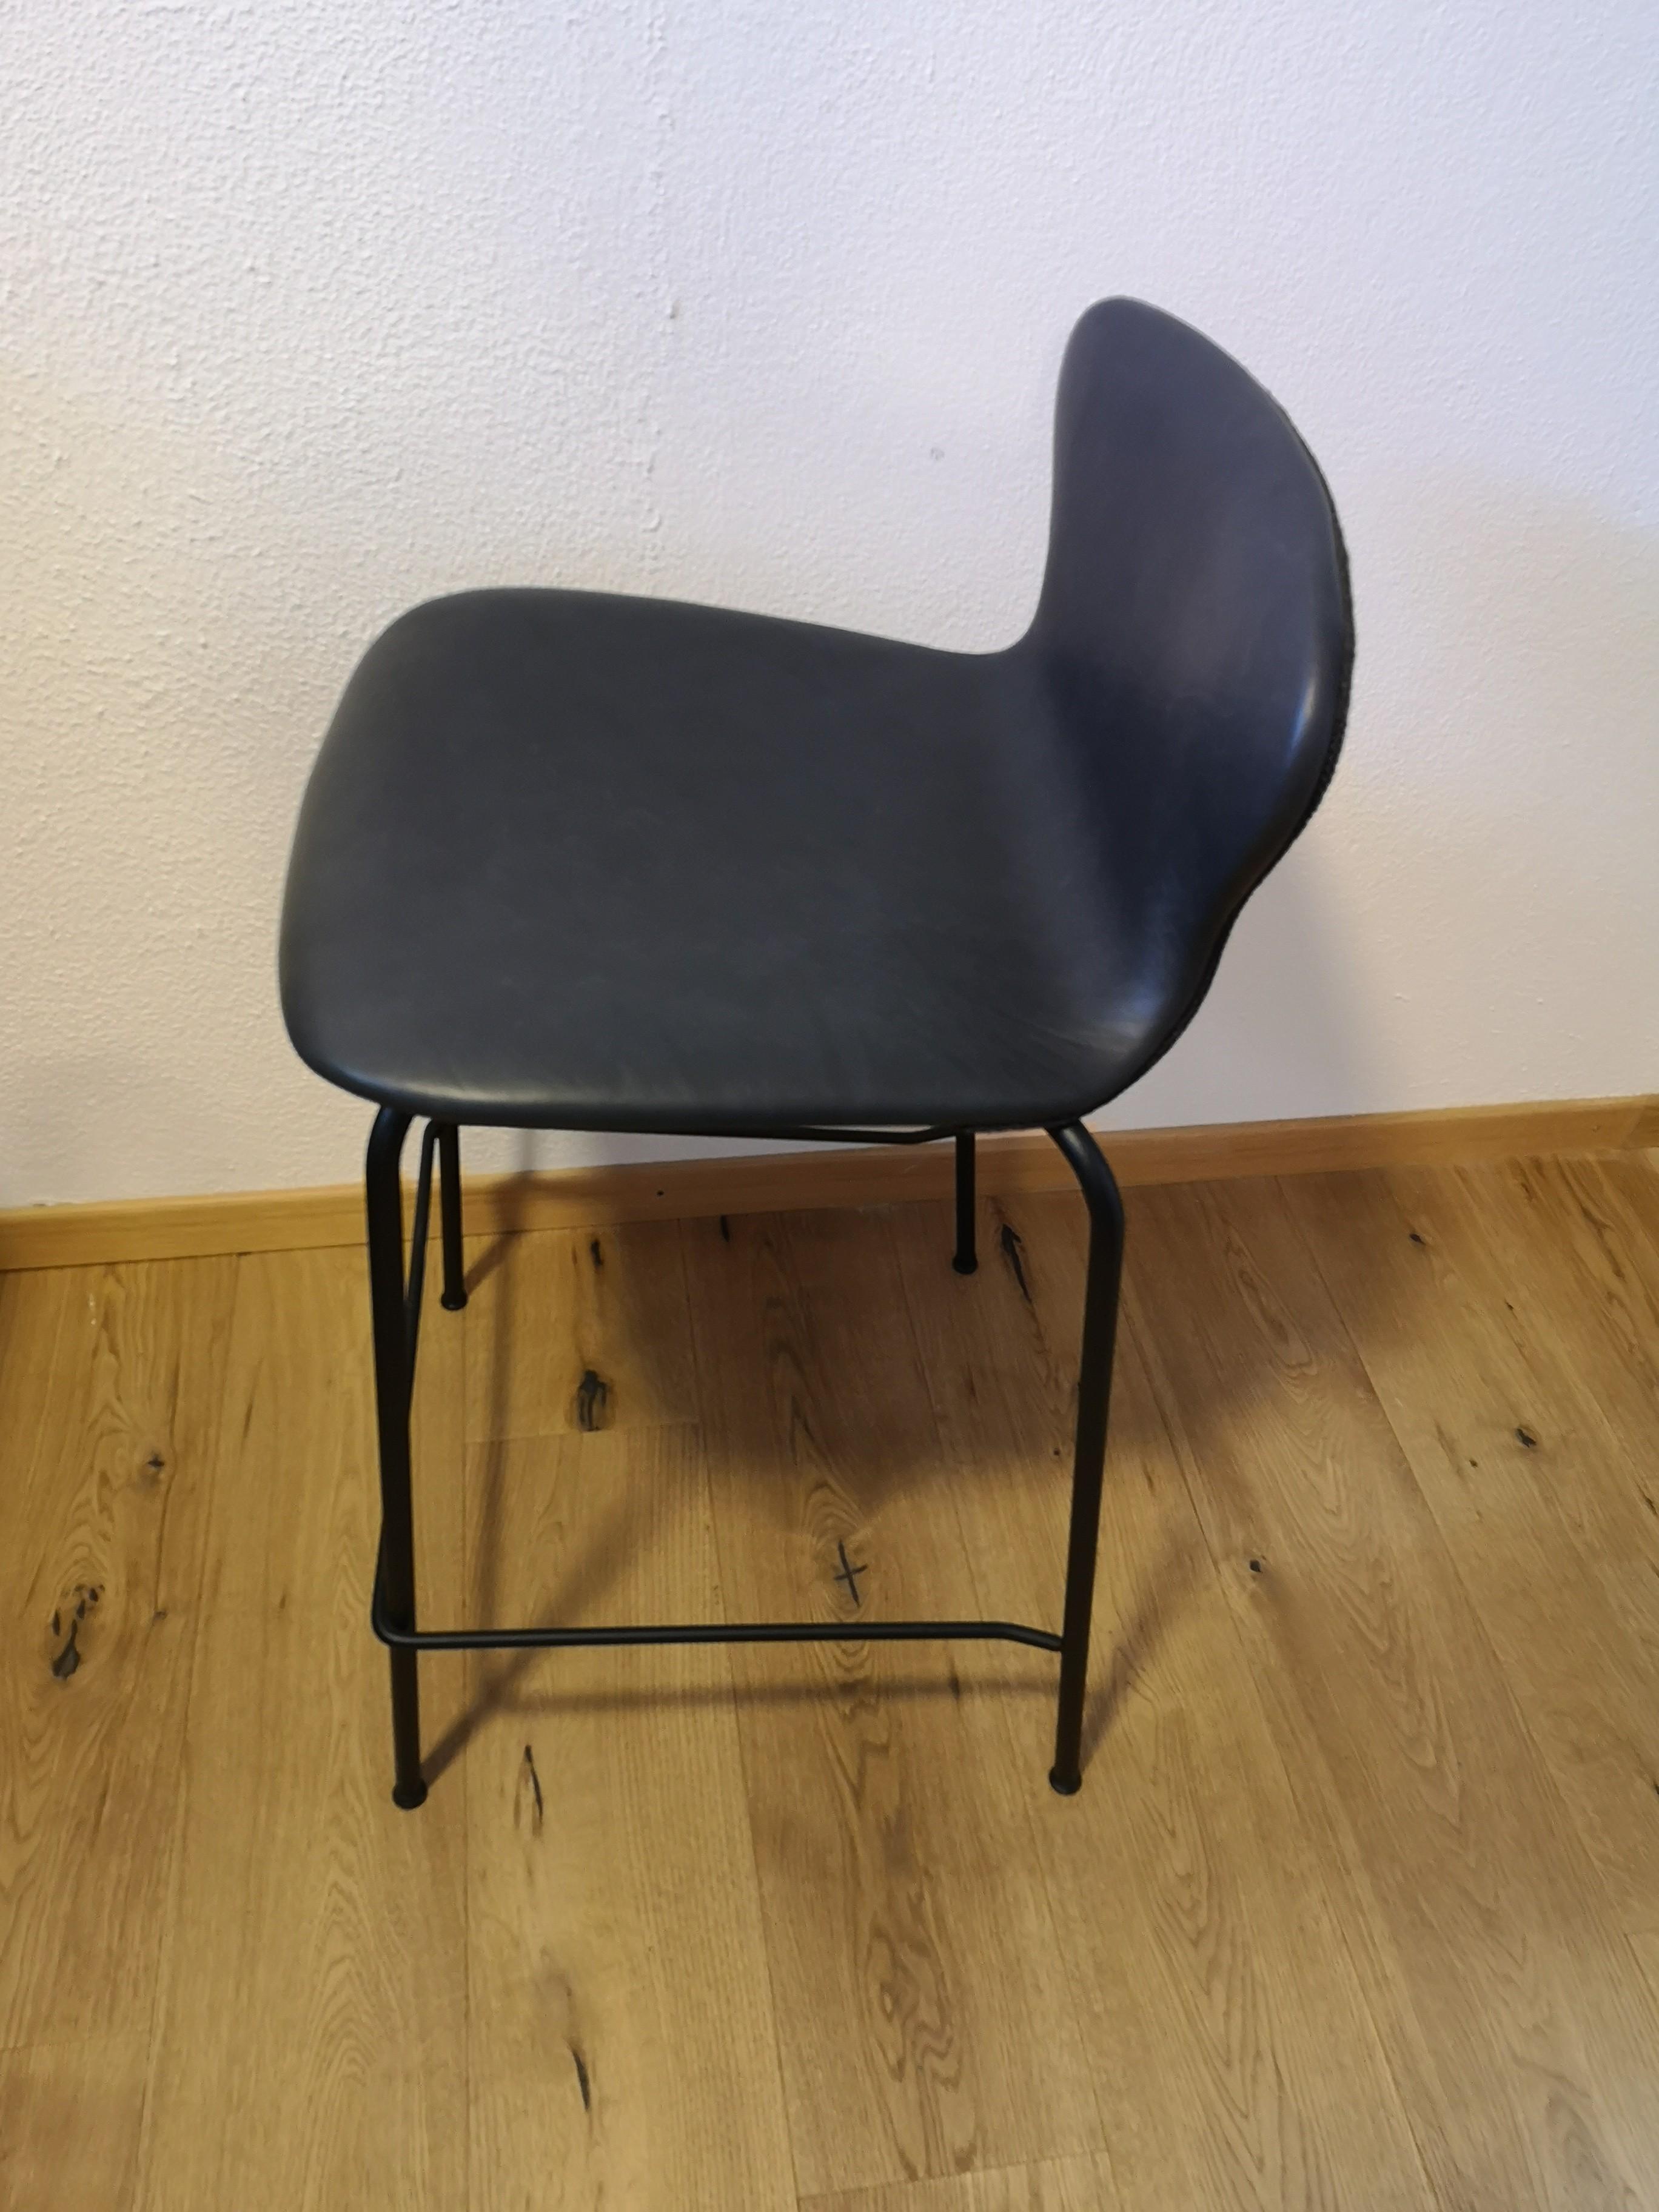 Barstuhl PLAYchar bar Sitzhöhe 65cm 06